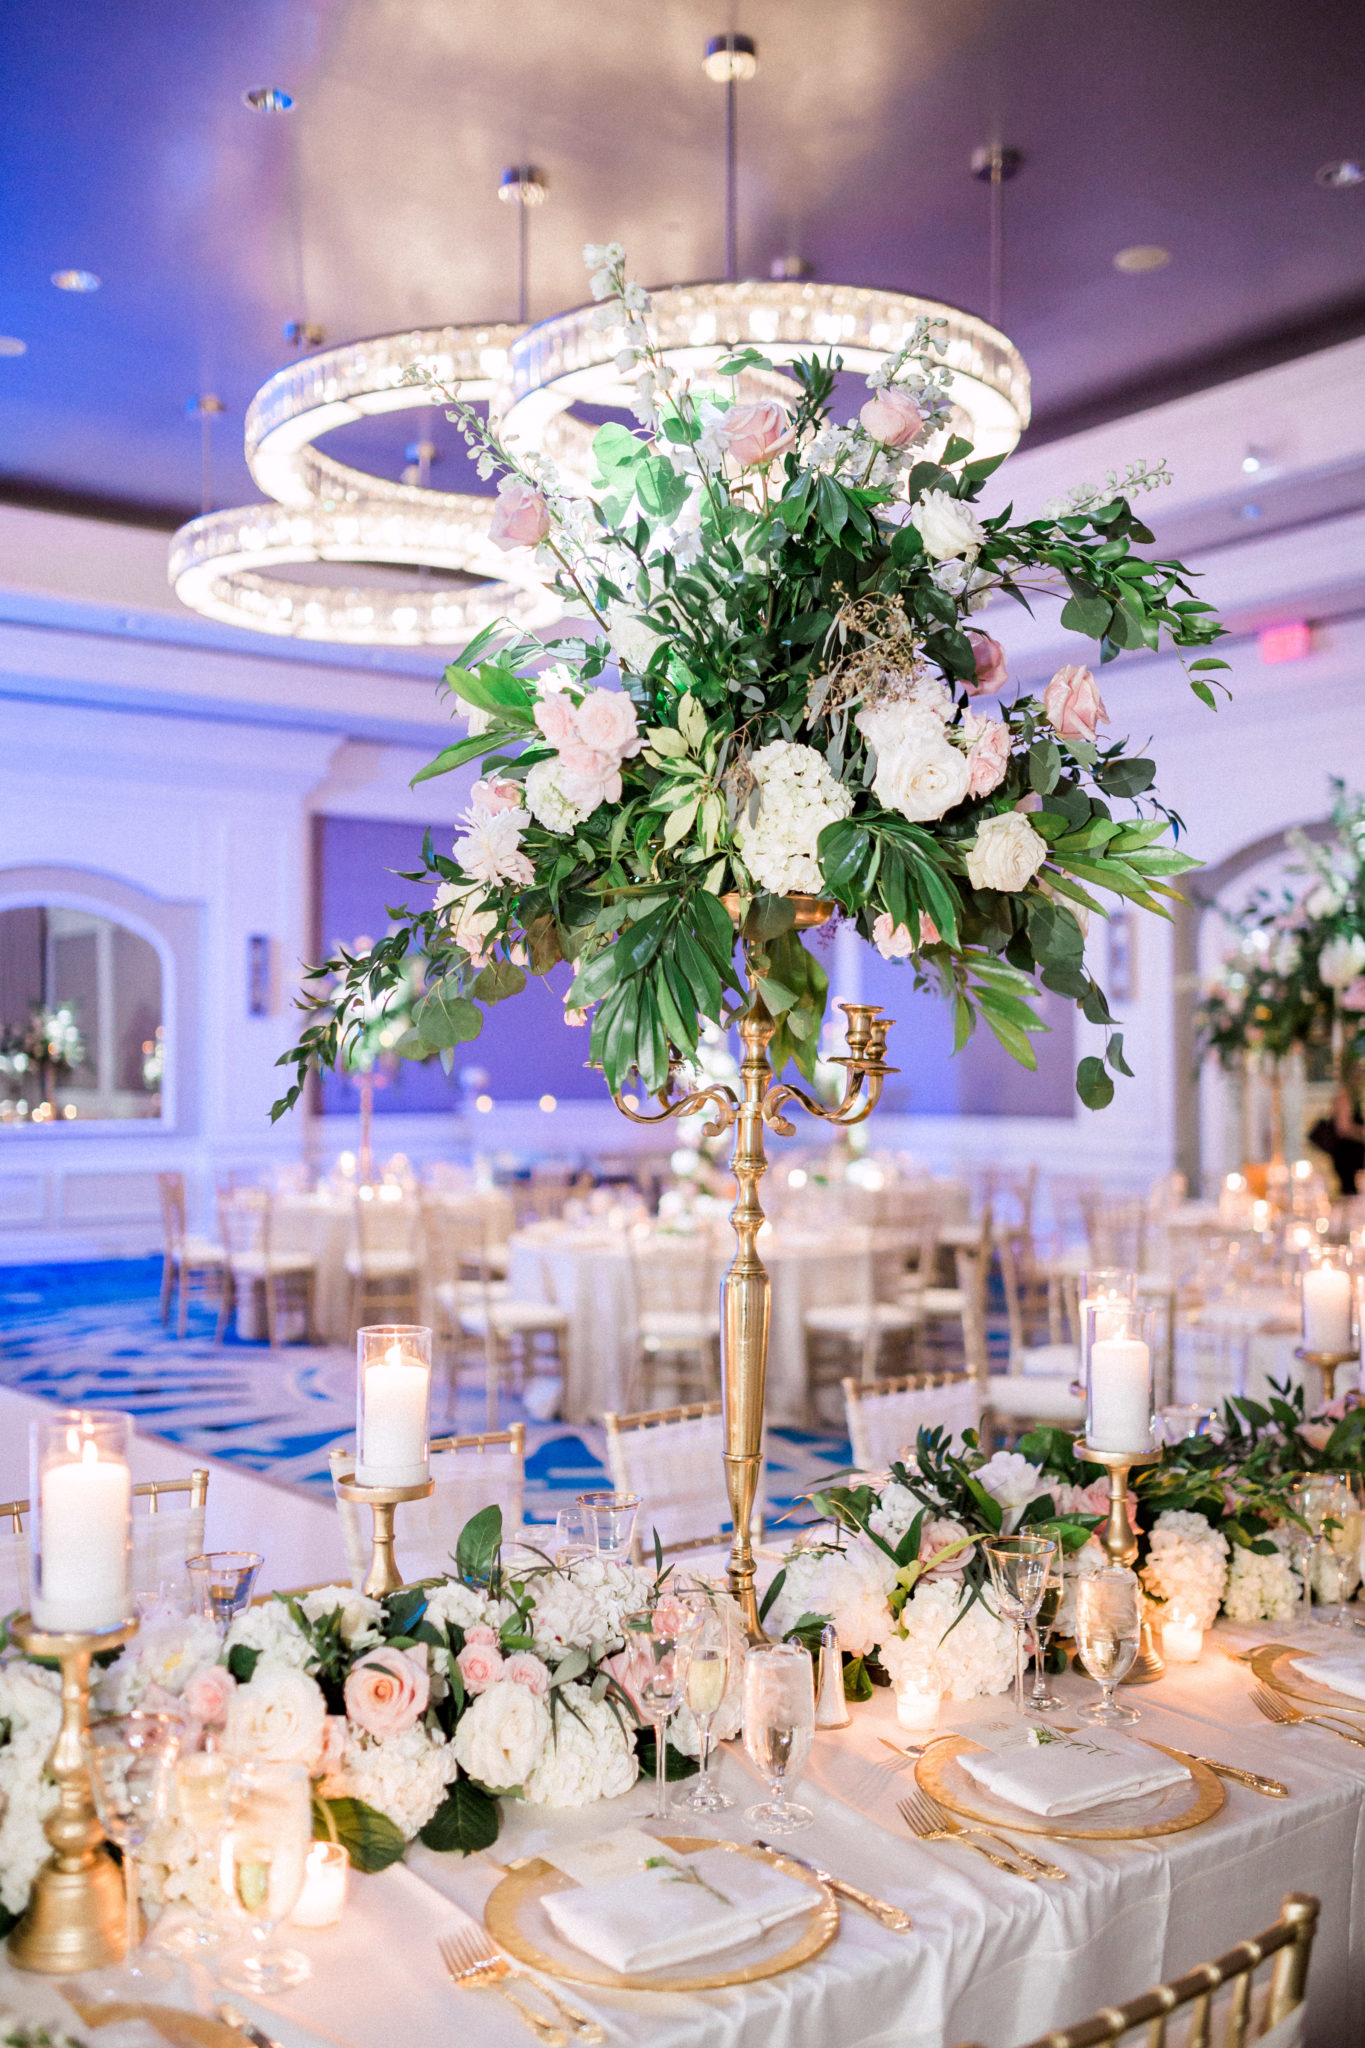 Event Planning Companies Ritz-Carlton